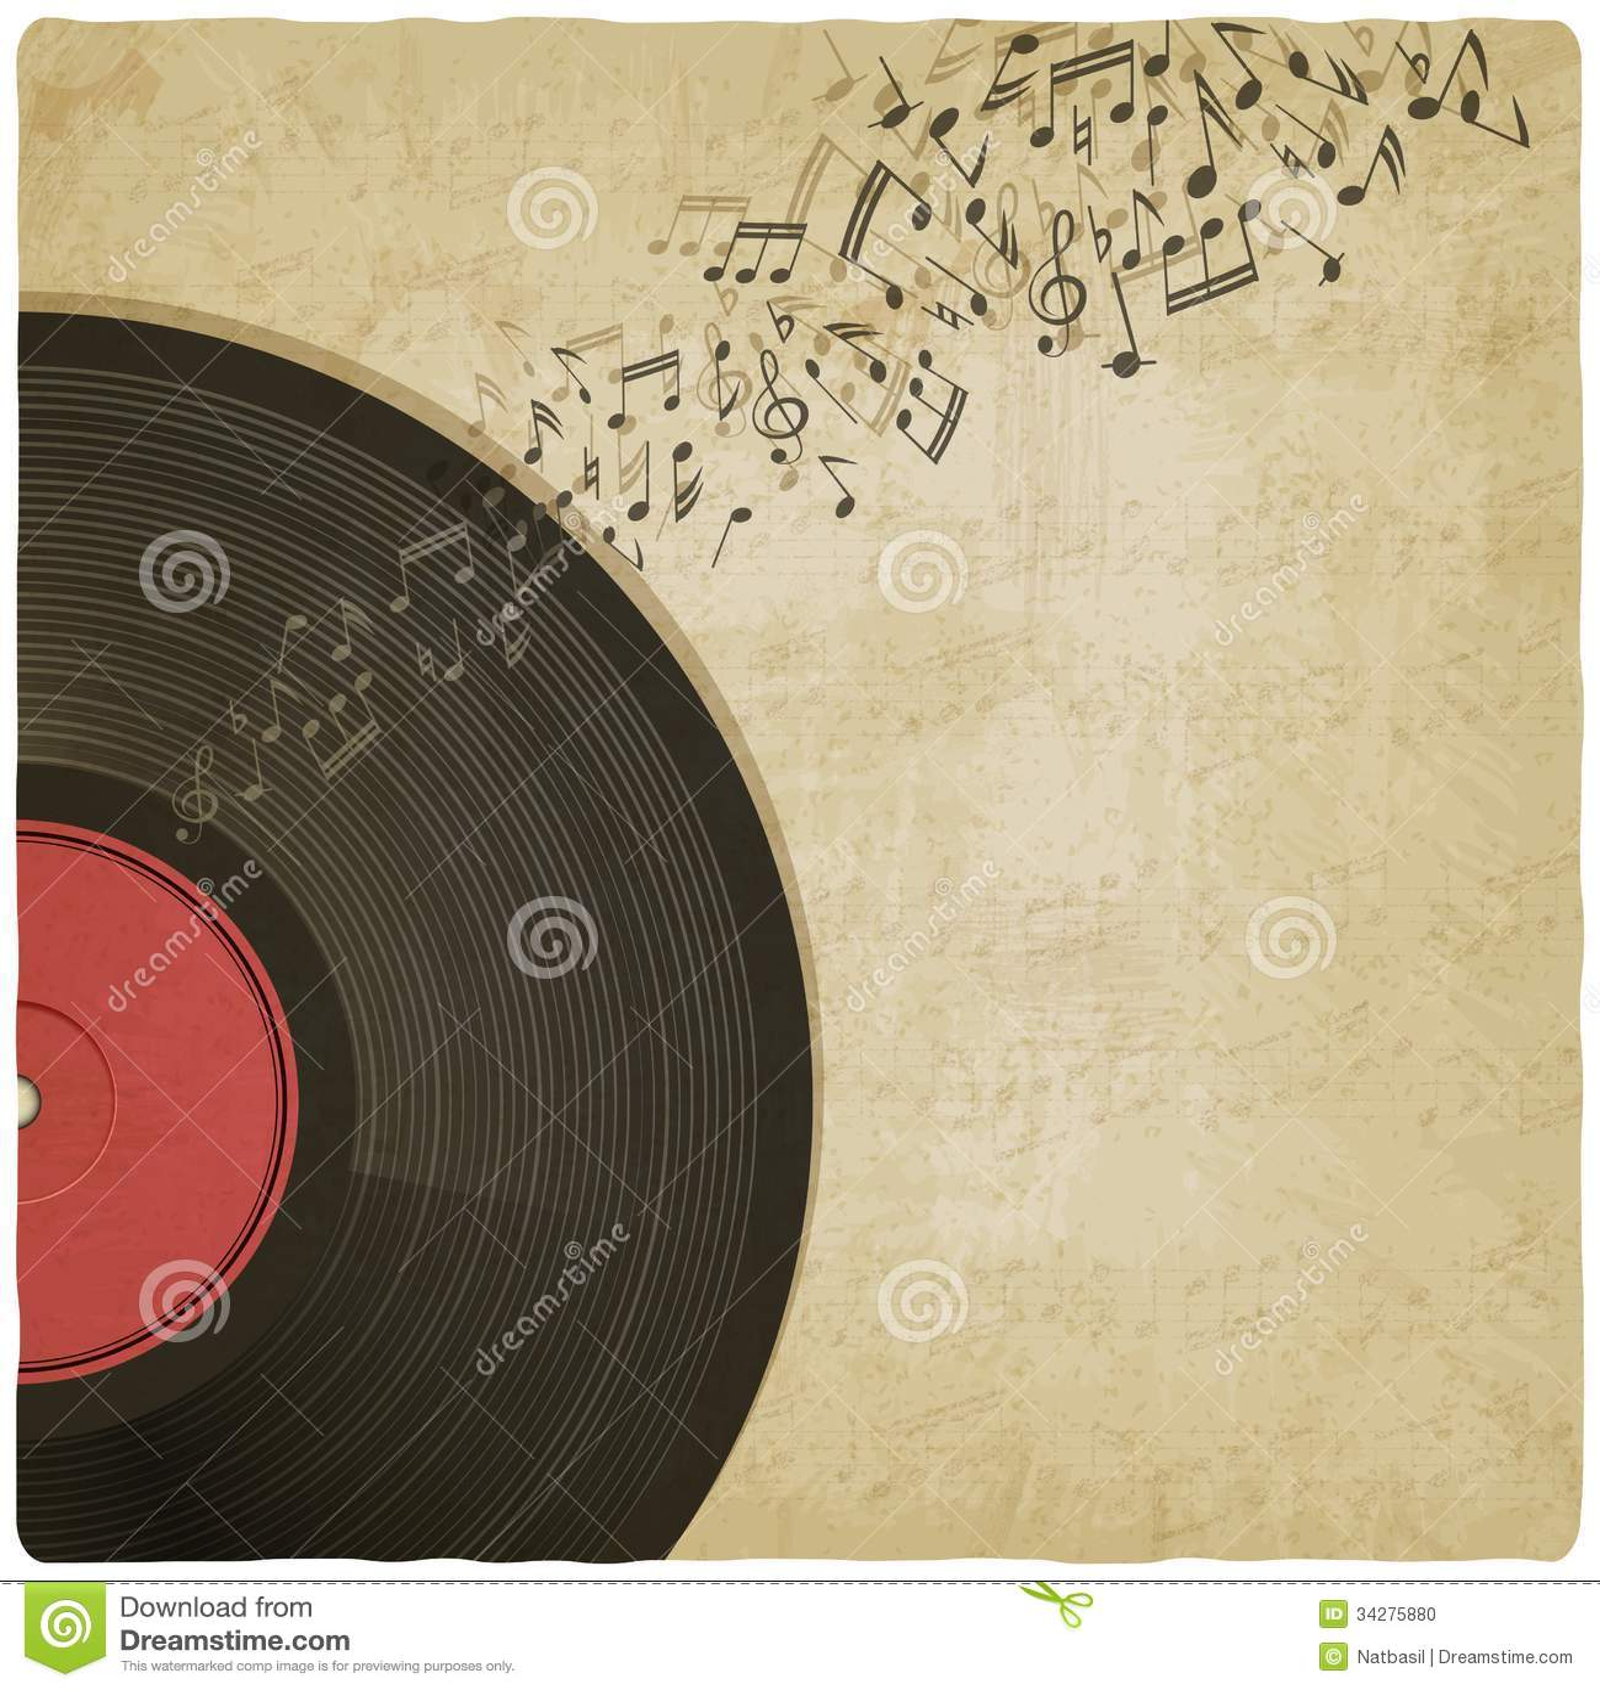 Vintage Background With Vinyl Record Stock Photo Image 34275880